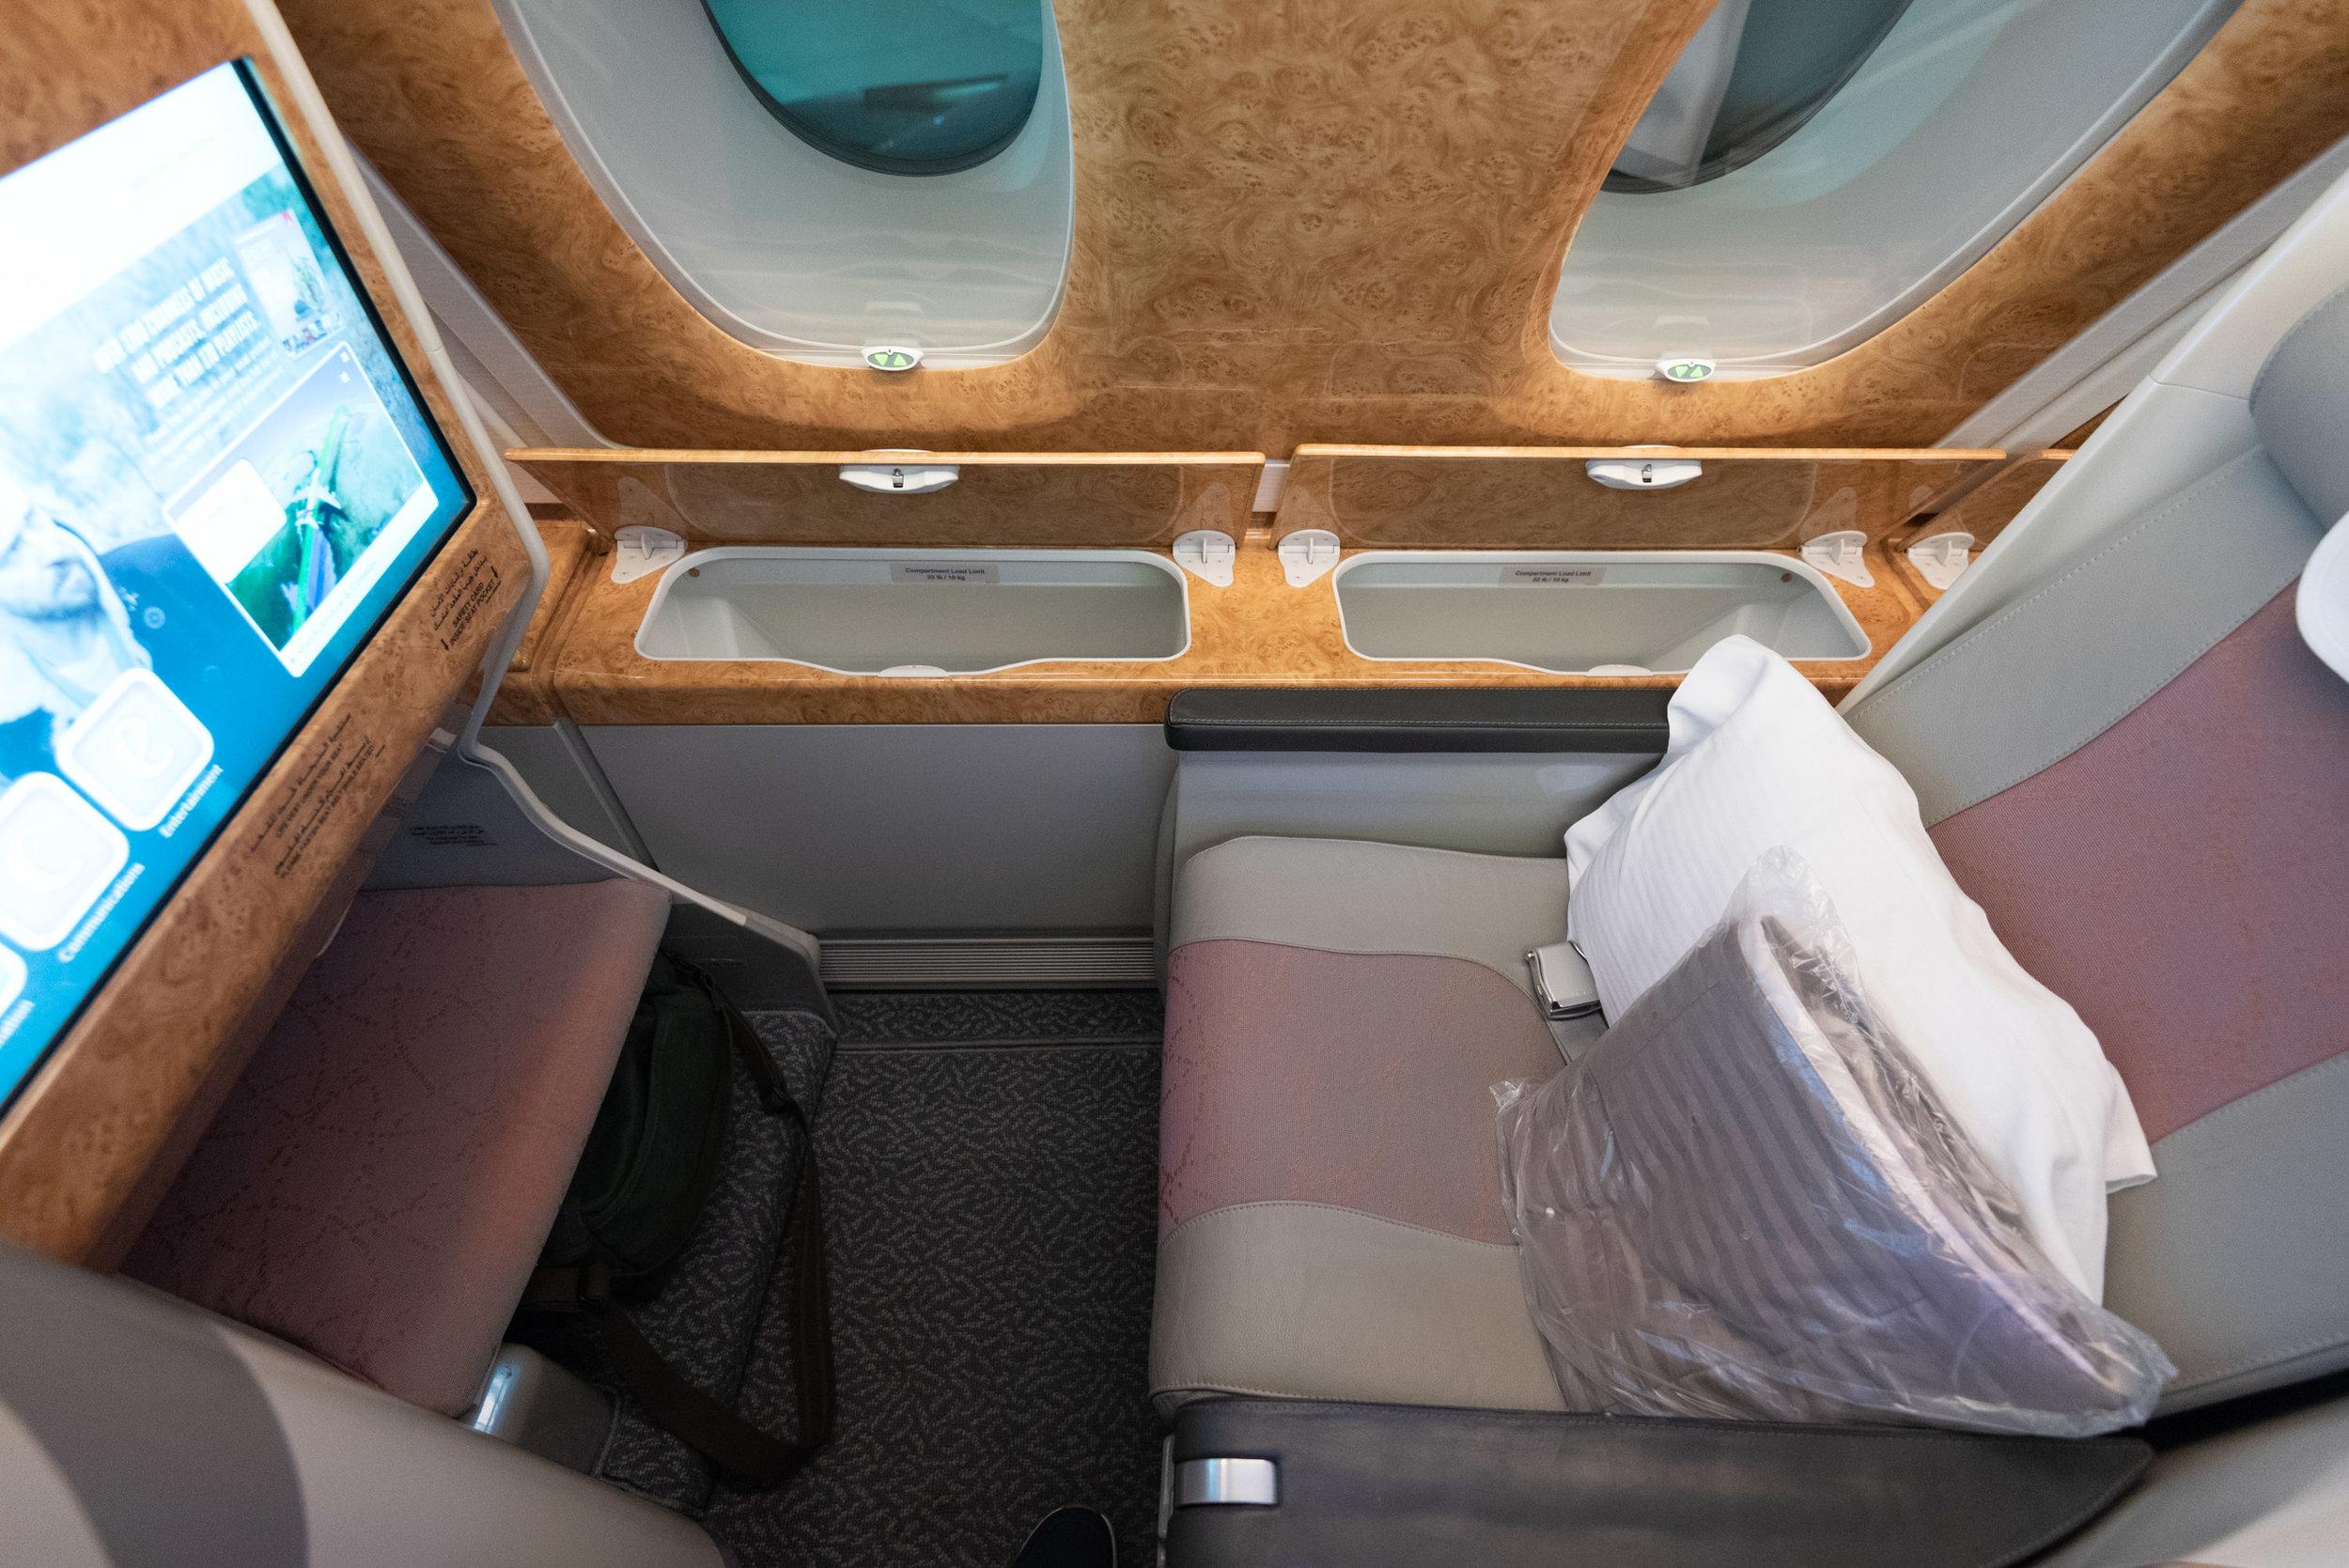 Seat 11K  Emirates Business Class EK202 A380-800 - JFK to DXB